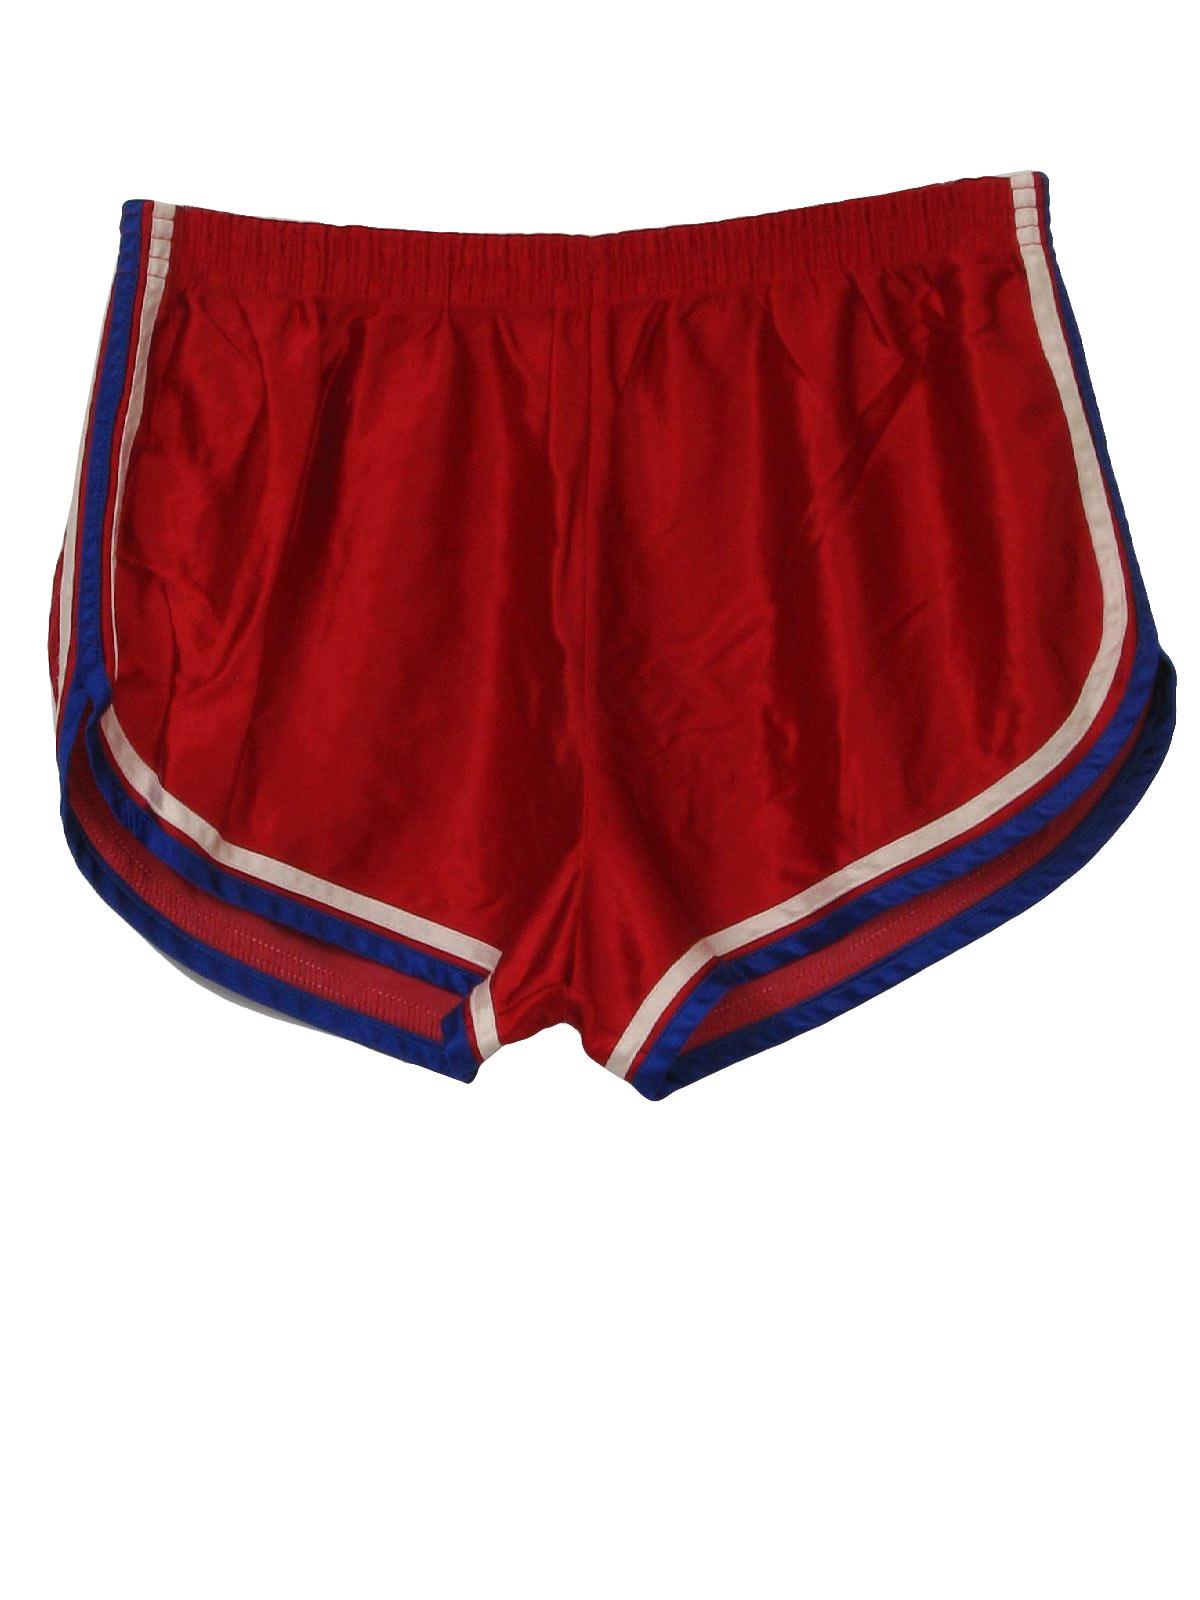 Care Label 80 S Vintage Shorts 80s Care Label Mens Red